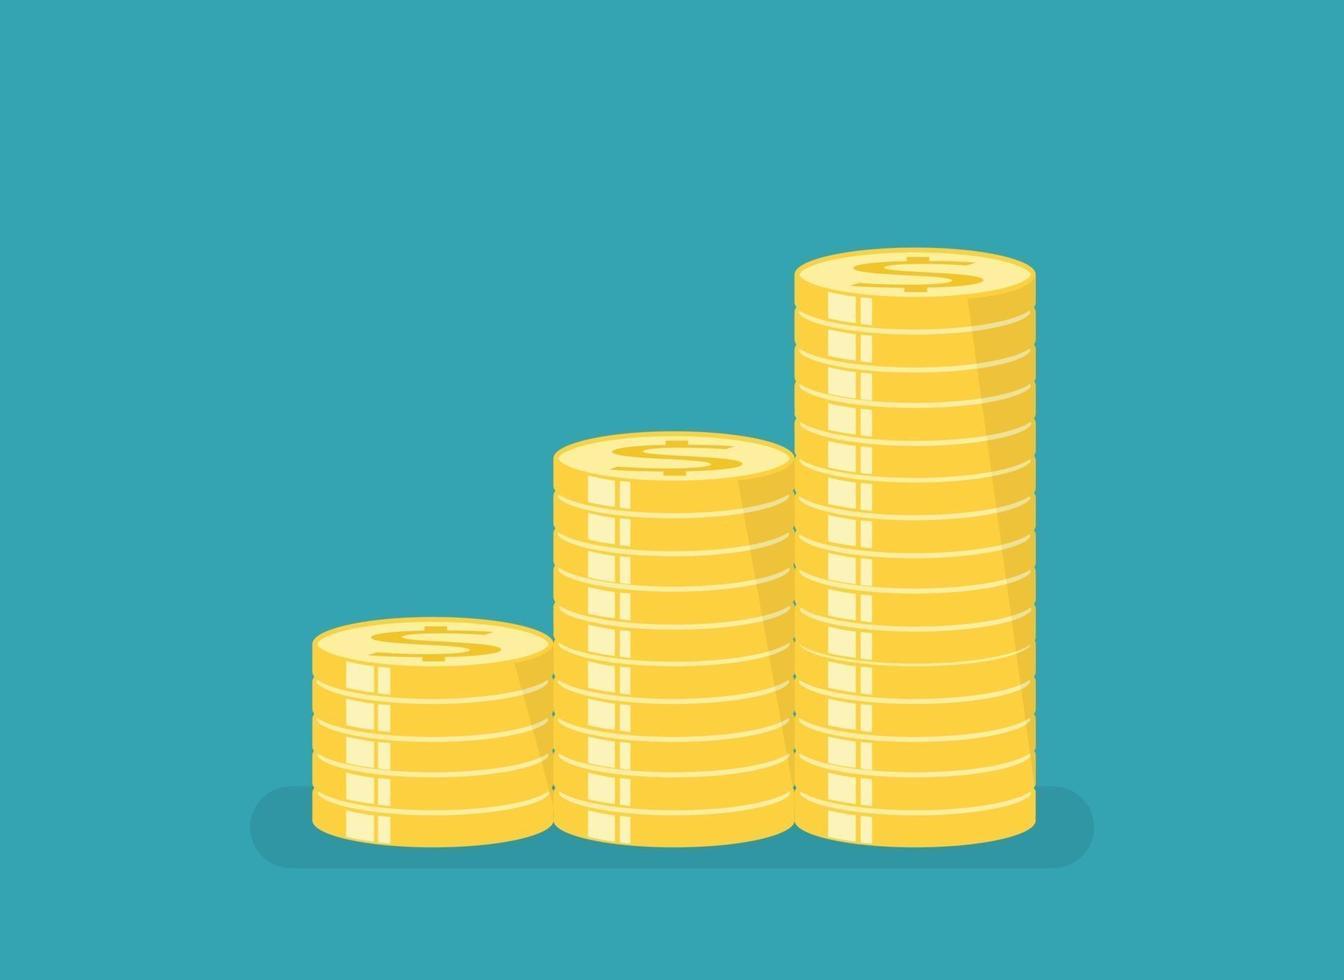 Goldmünzen mit abgestufter Sorte. Vektorillustration vektor